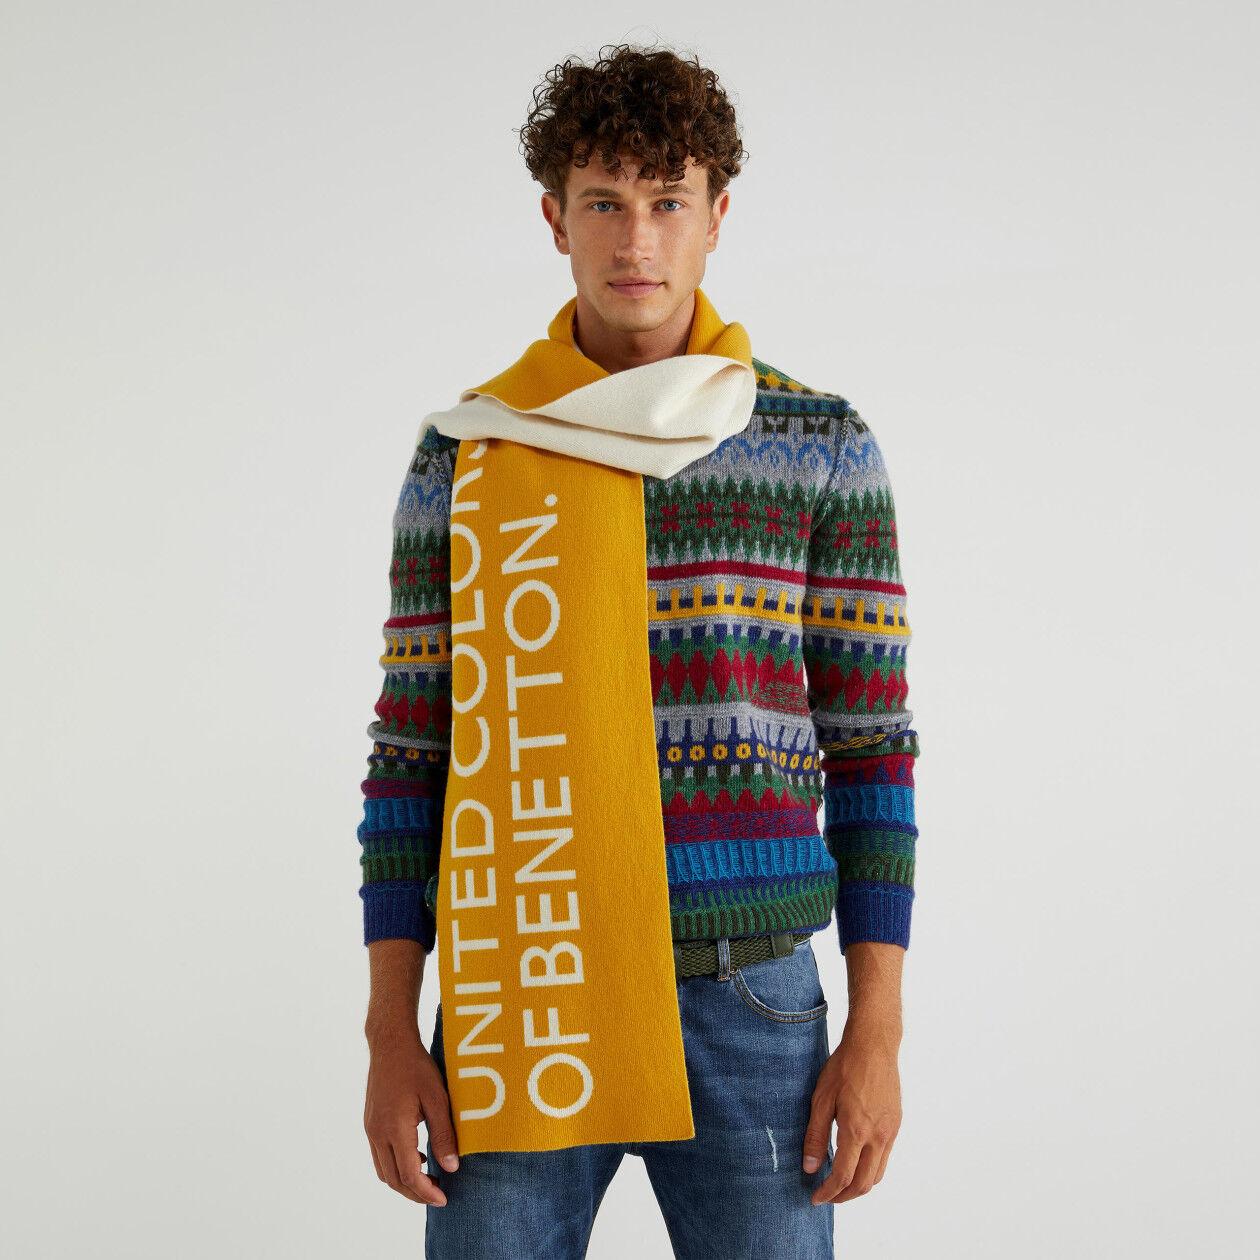 Unisex scarf with logo